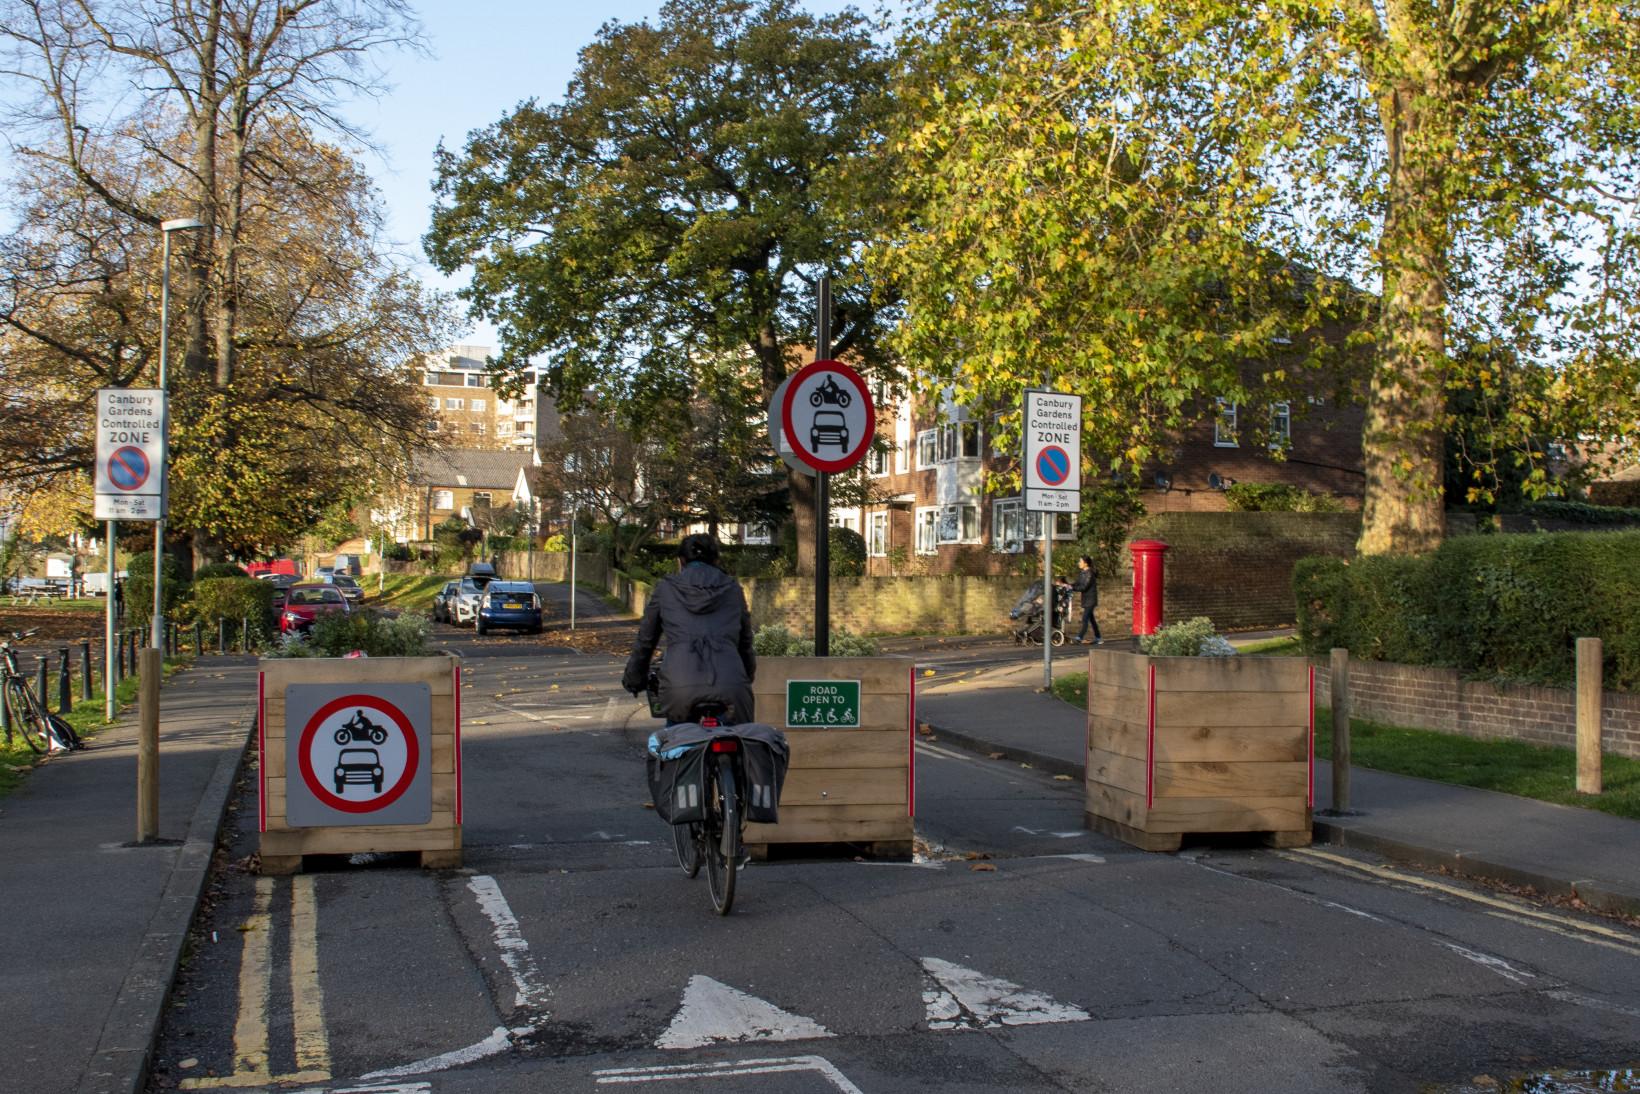 ltn, low-traffic neighborhood, car, bike, future, city